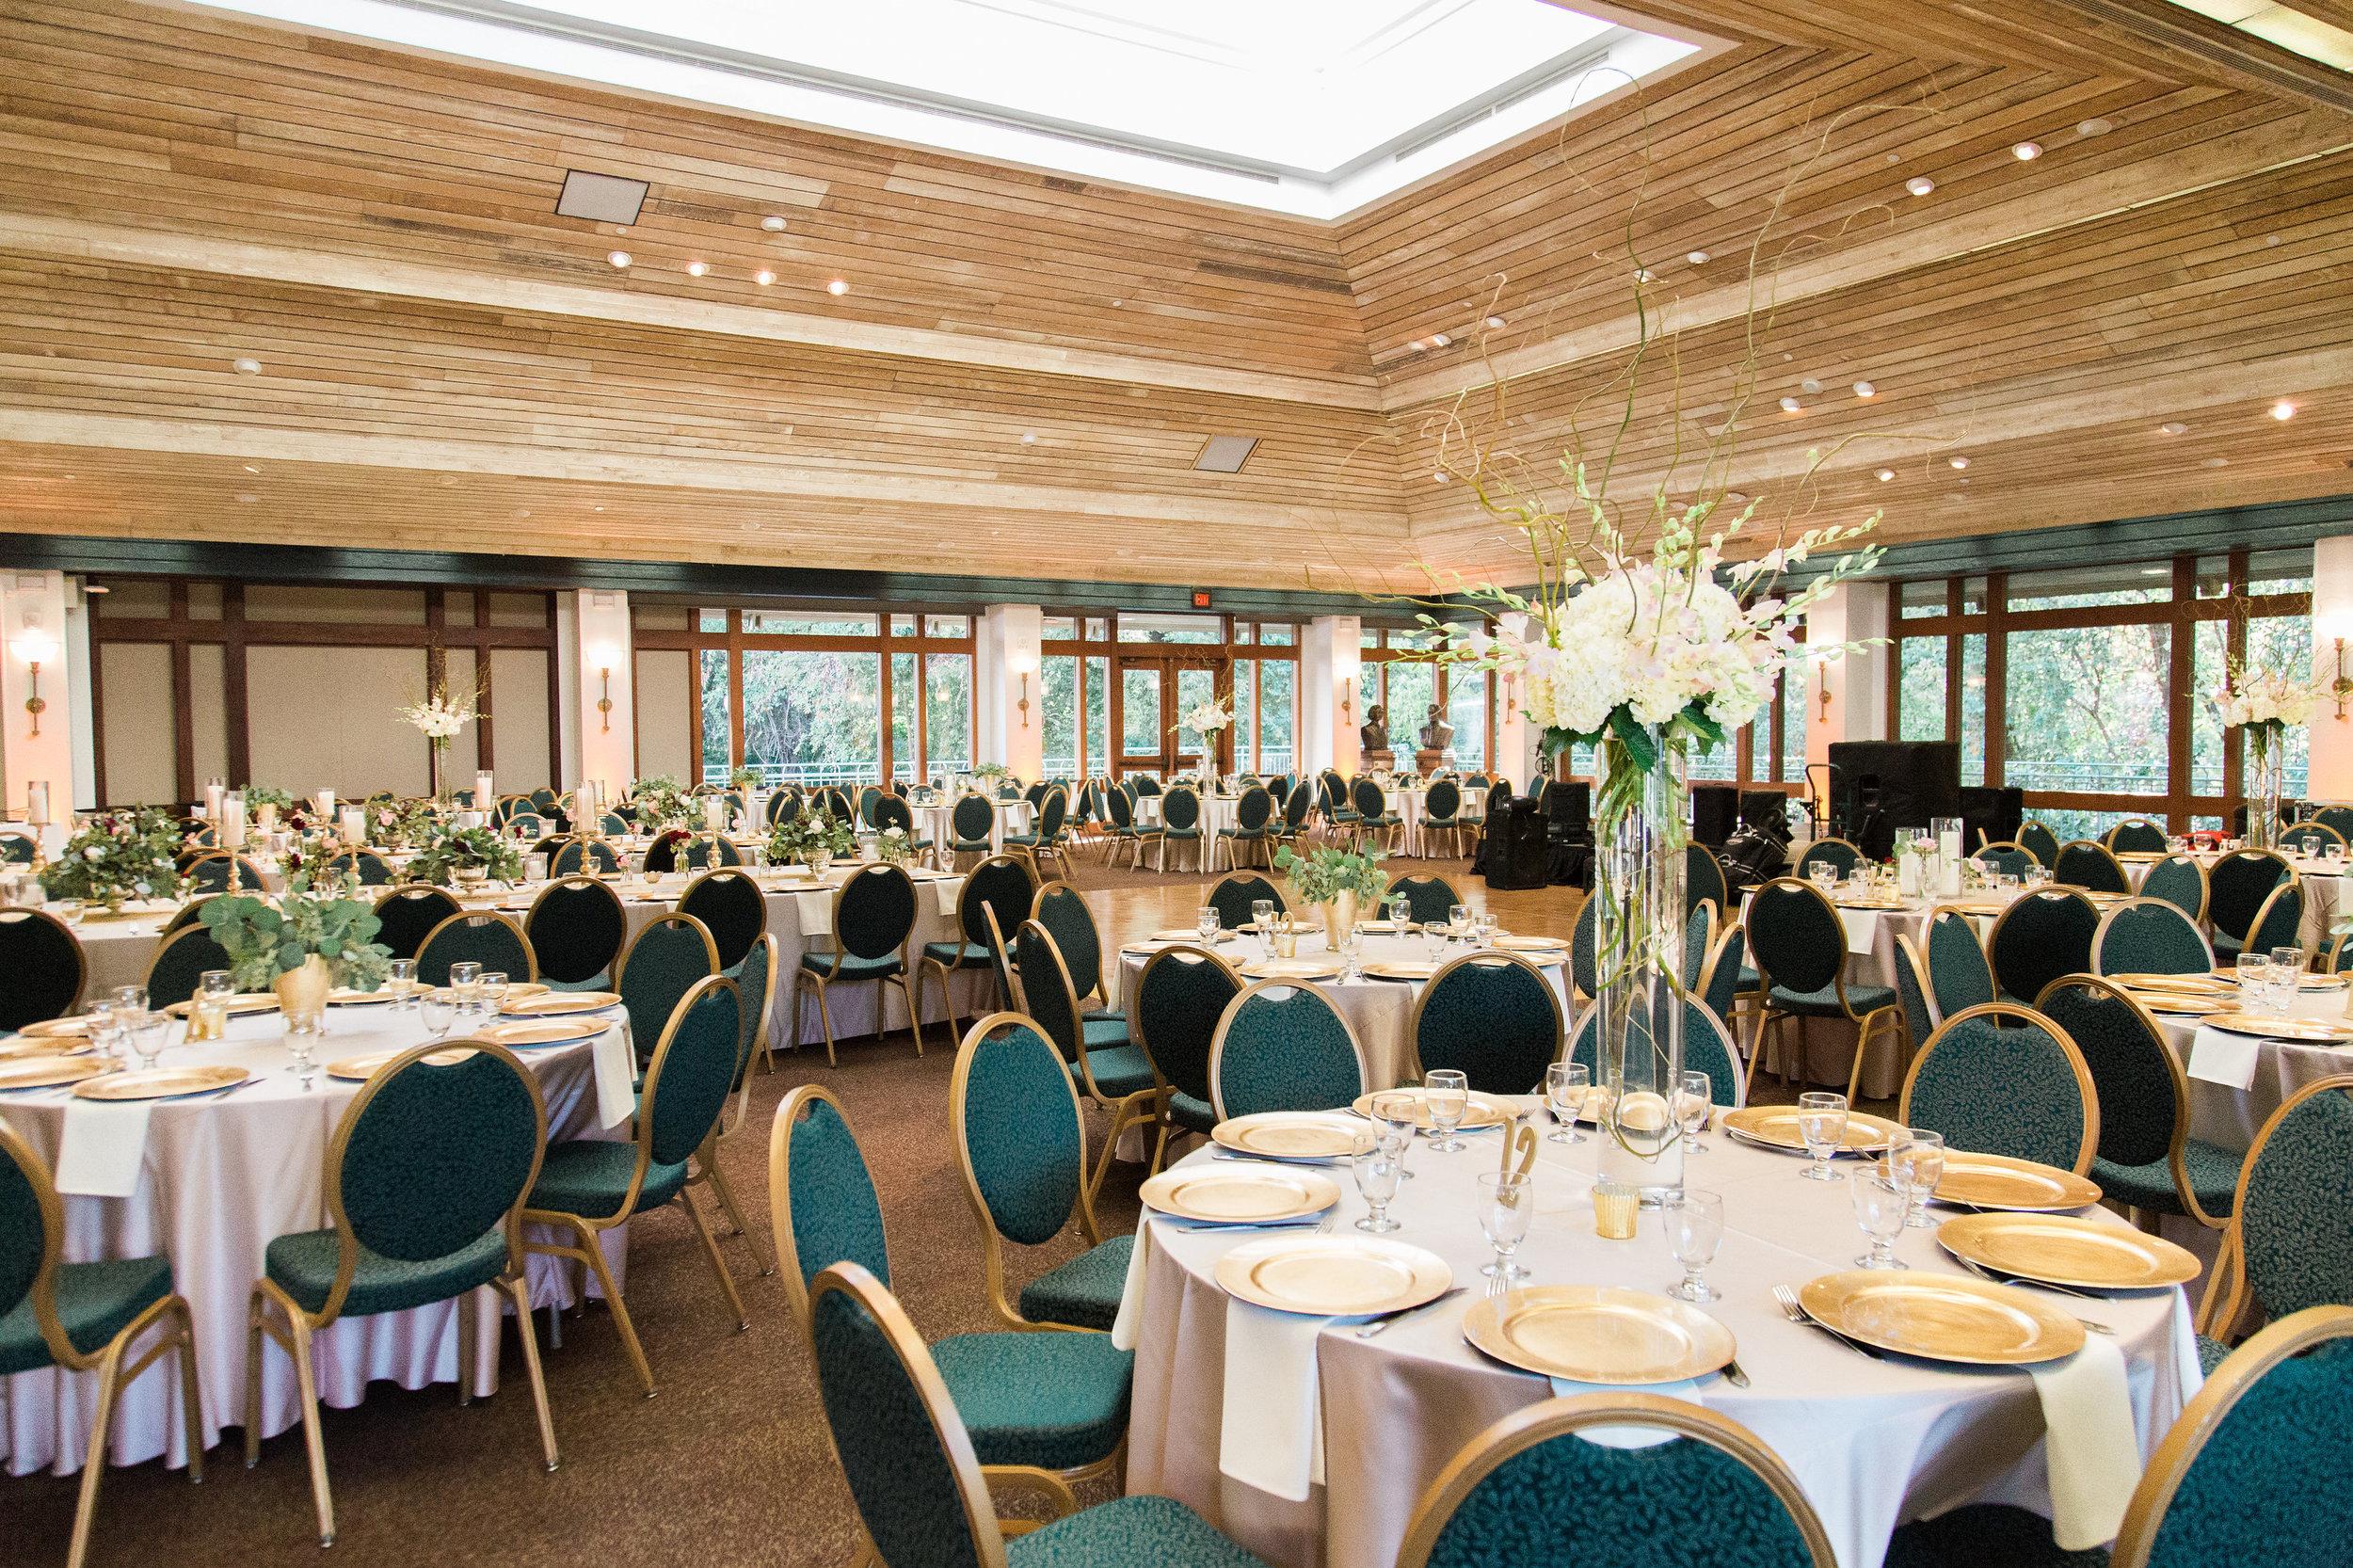 full seating for wedding reception in ballroom